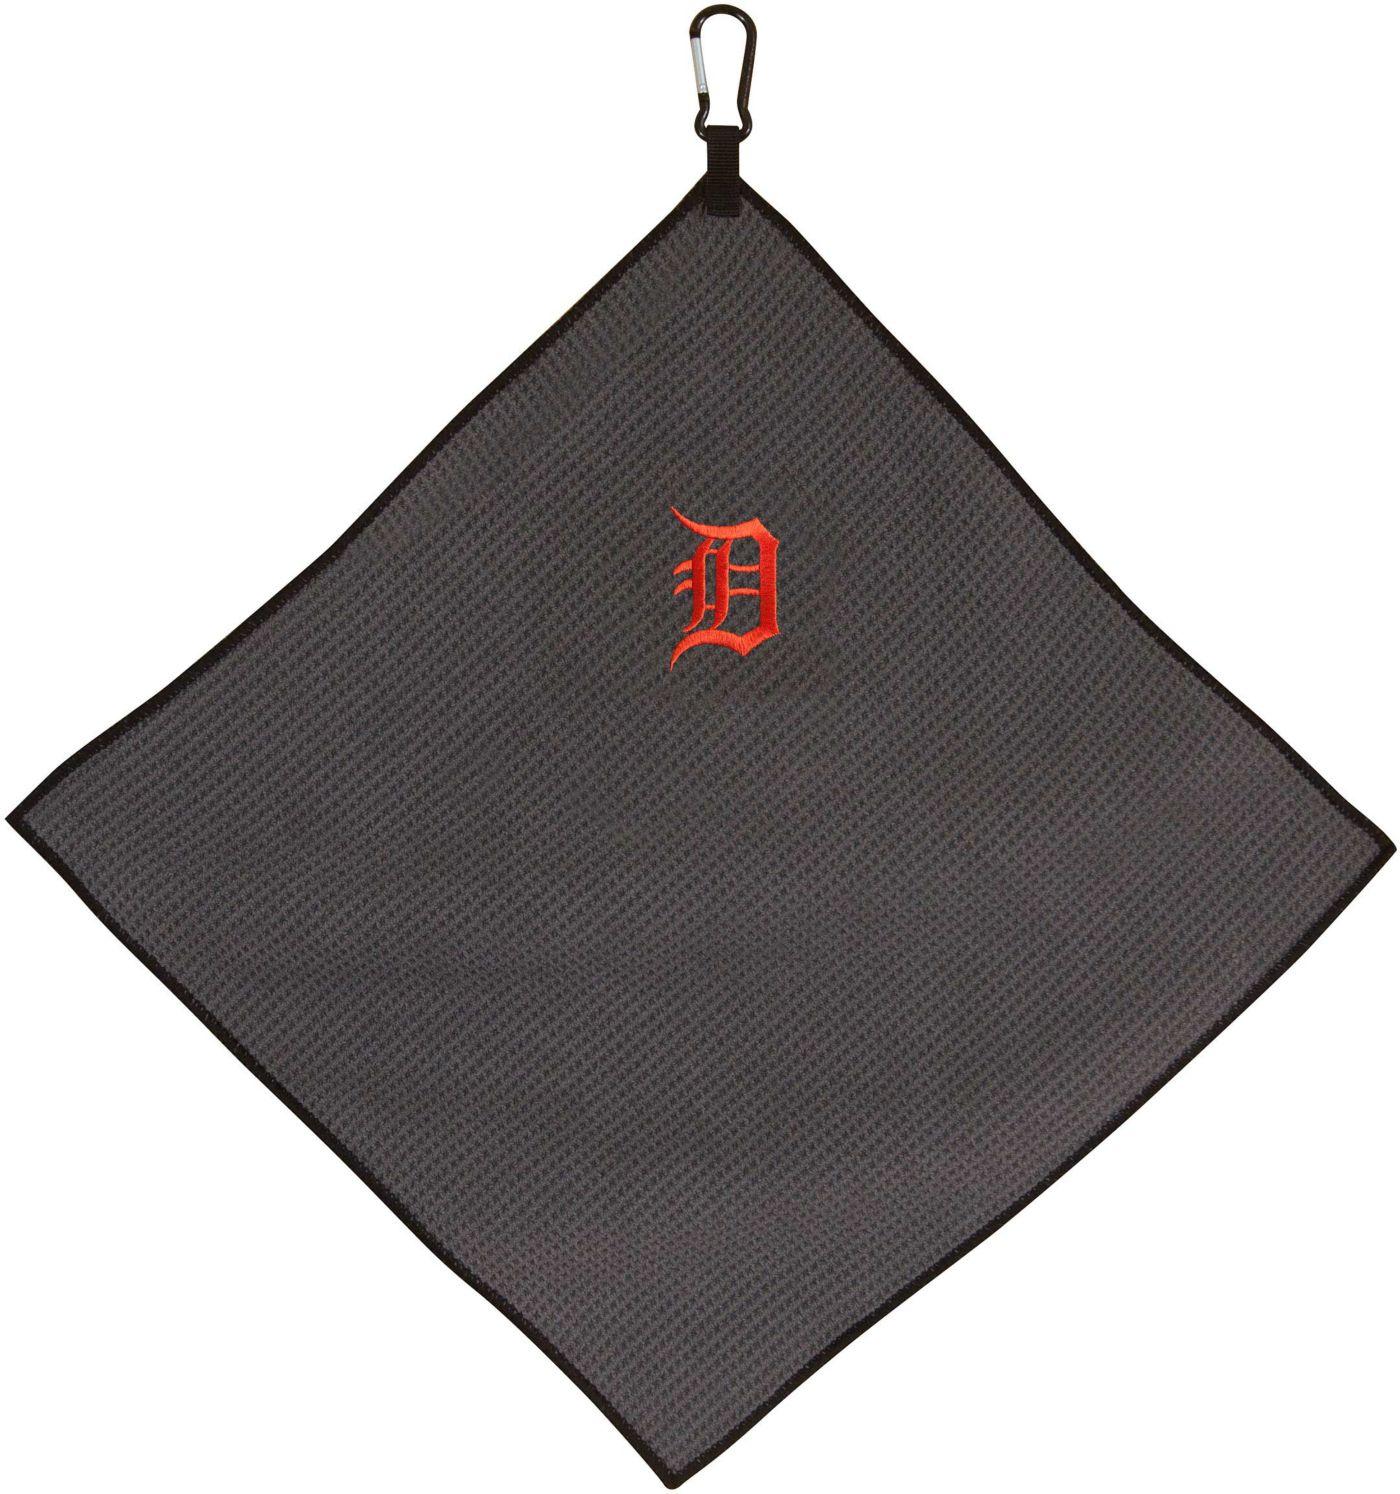 "Team Effort Detroit Tigers 15"" x 15"" Microfiber Golf Towel"